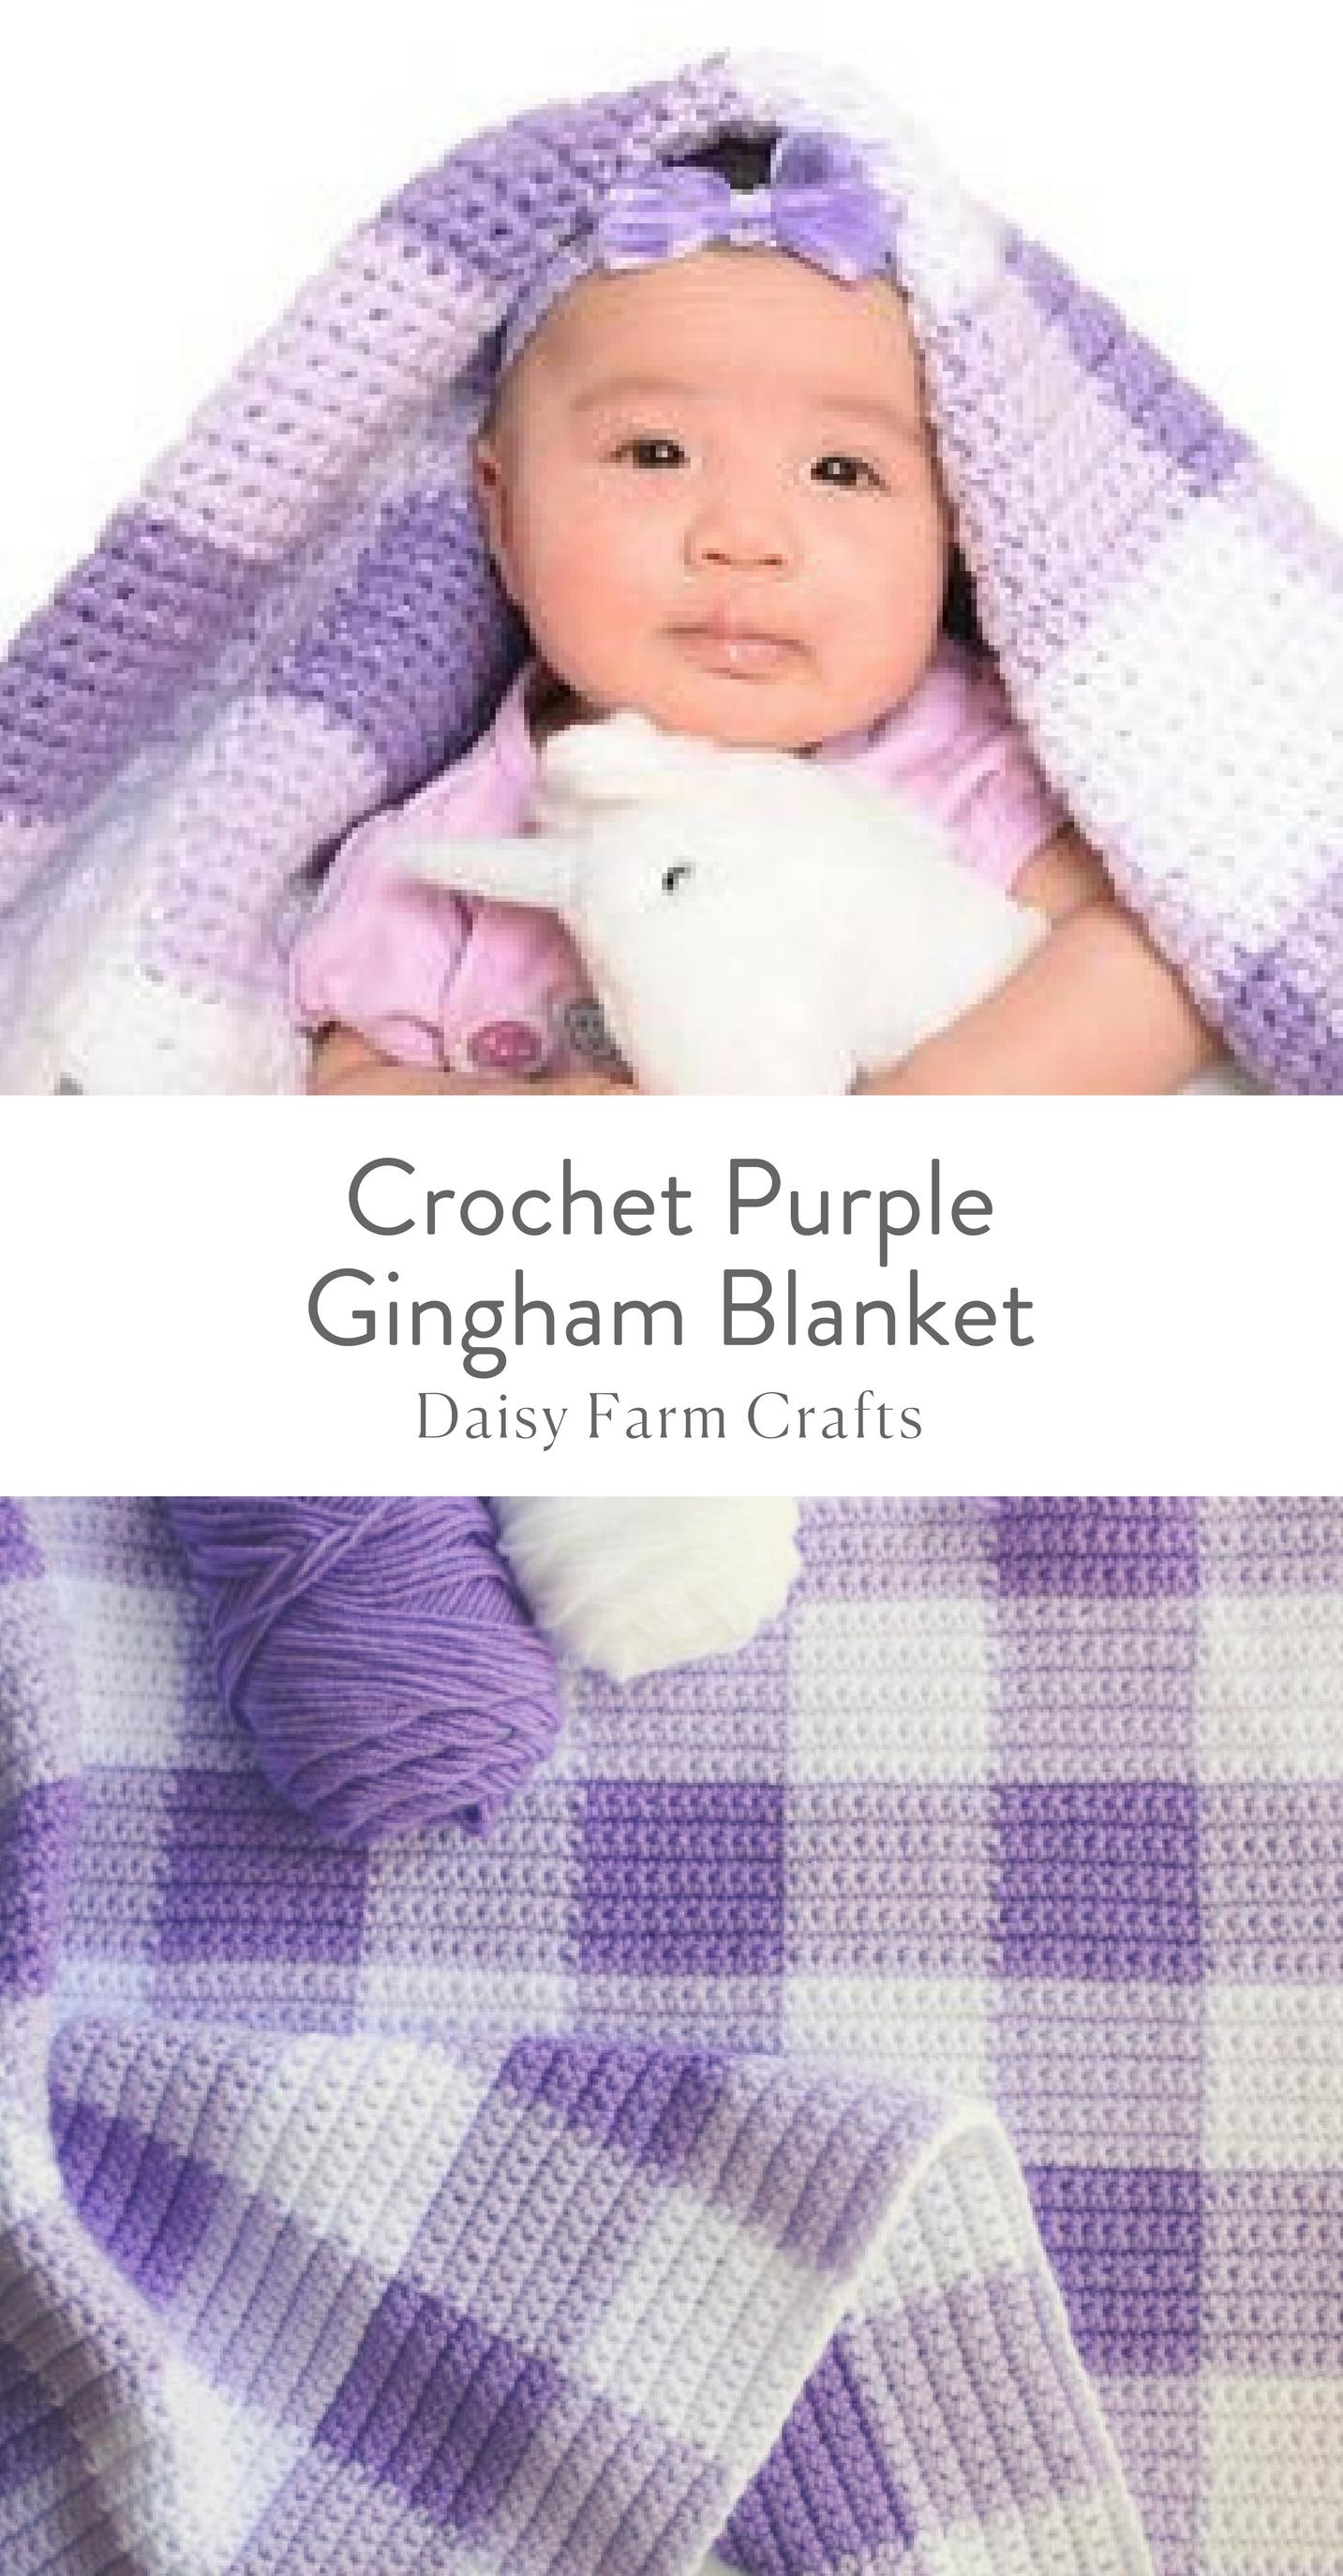 Free Pattern - Crochet Purple Gingham Blanket | Crochet | Pinterest ...